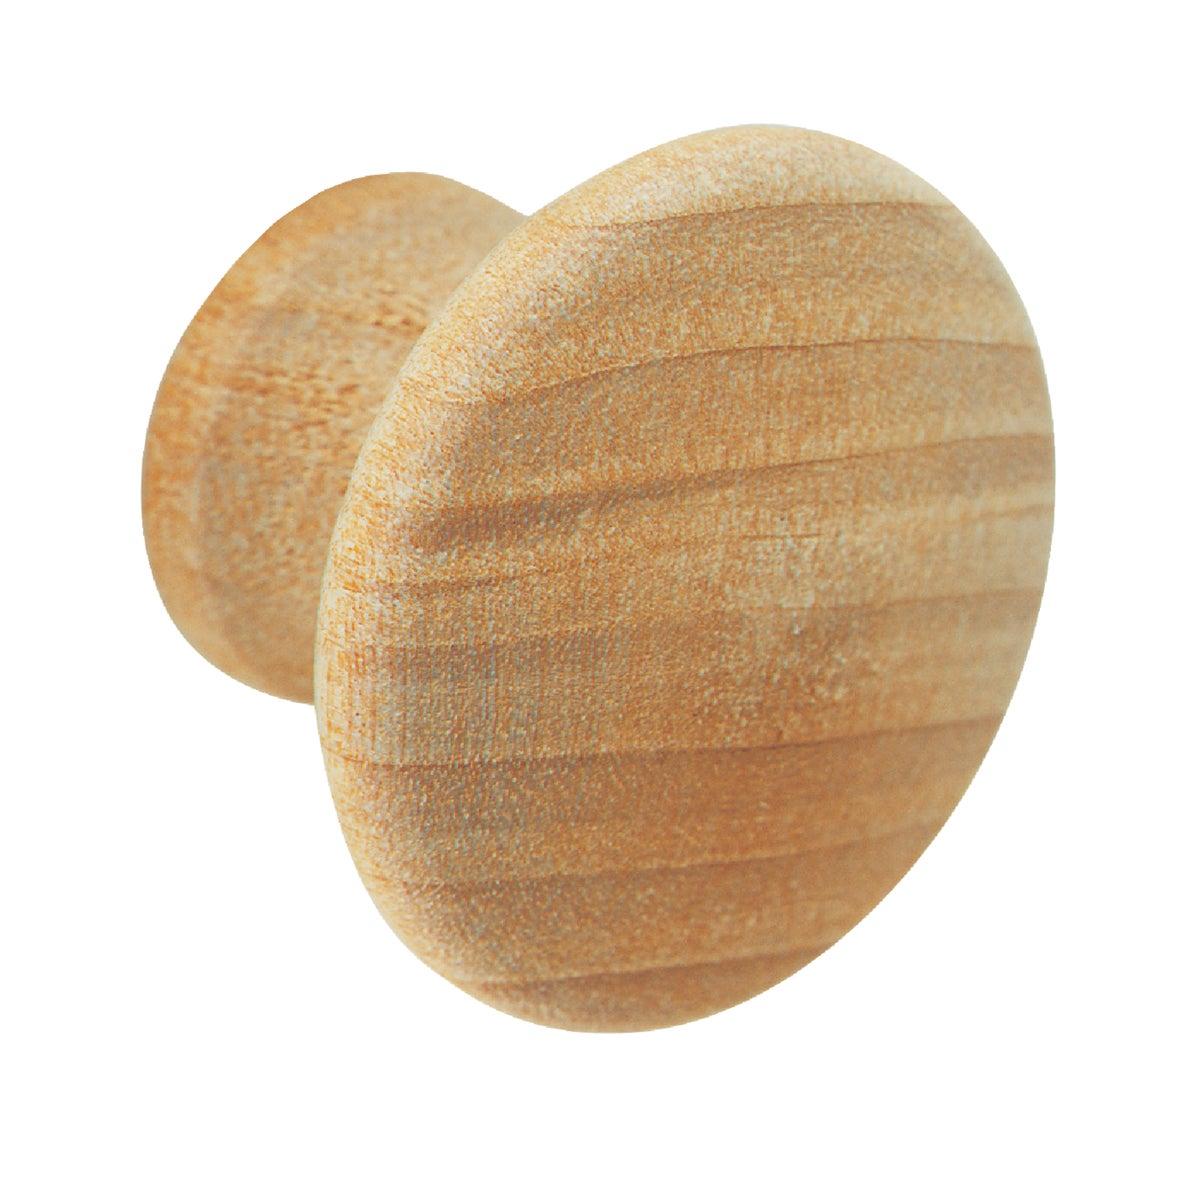 Amerock 1-1/4 In. Round Wood Knob